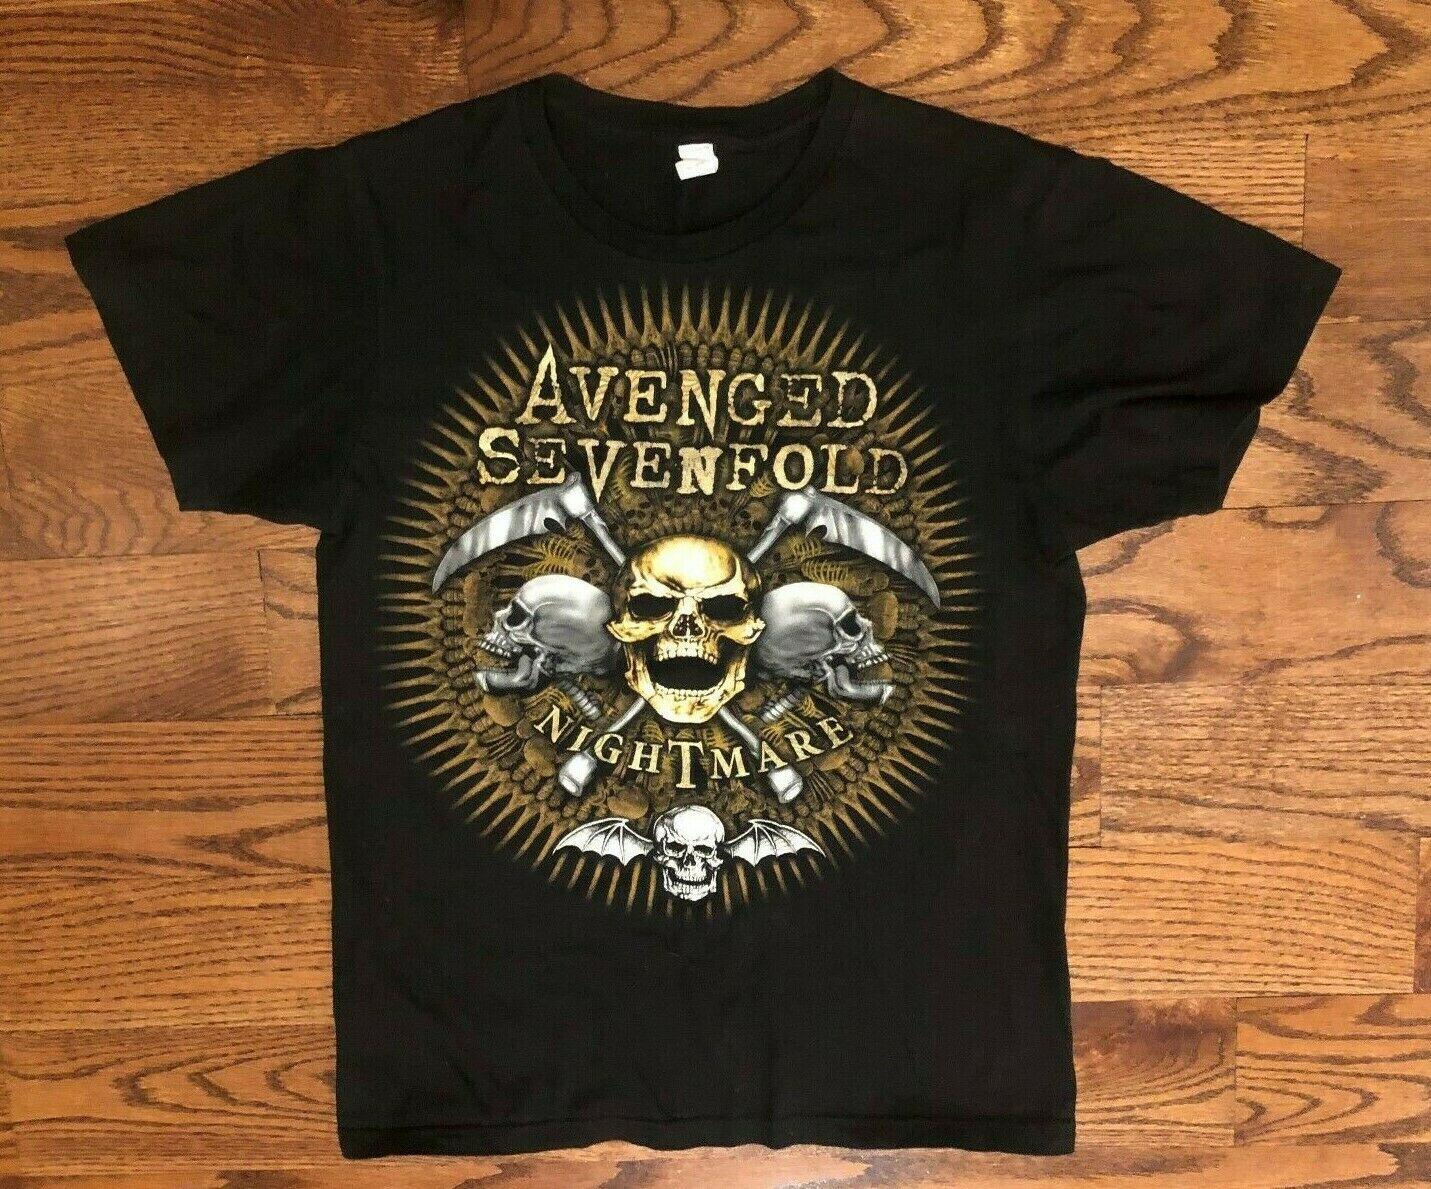 Vingado sevenfold a7x pesadelo oficial camisa preta t masculino pequeno